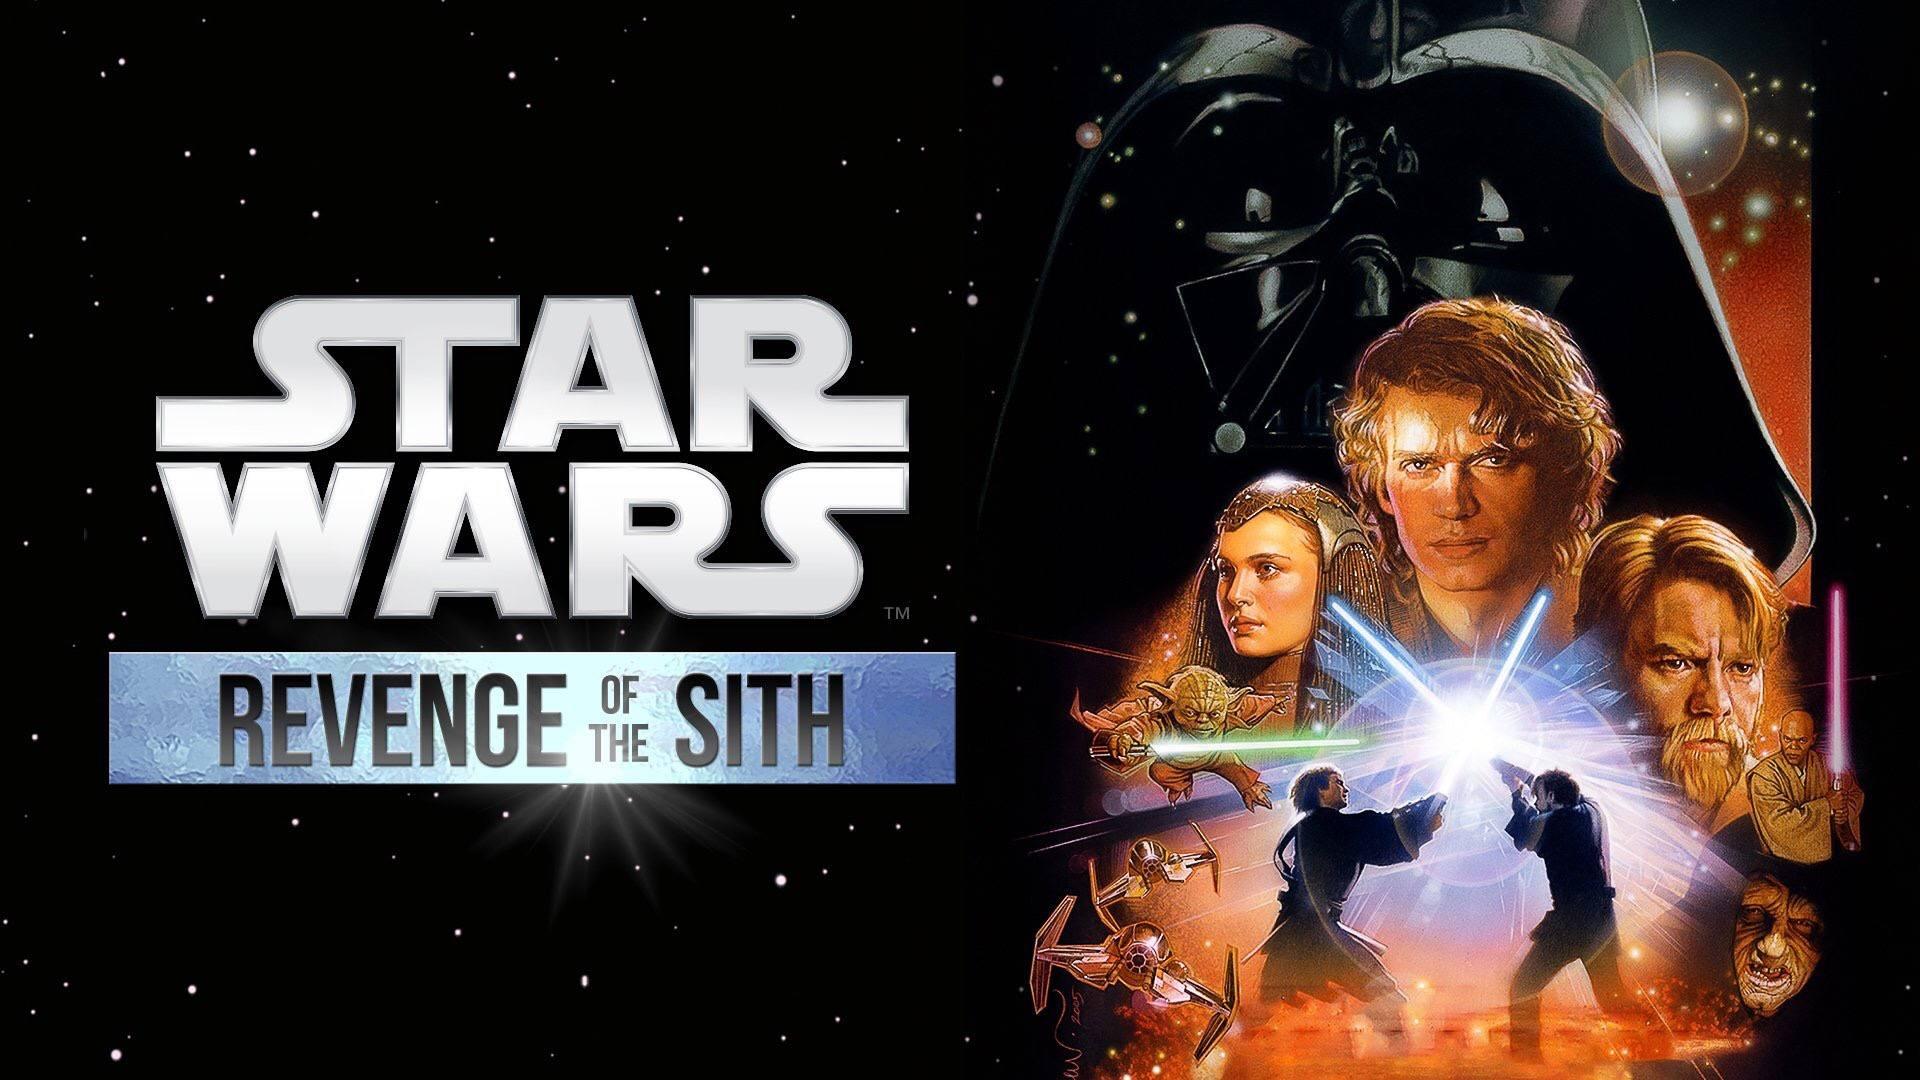 Star Wars: Episode III - Revenge of the Sith (2005)